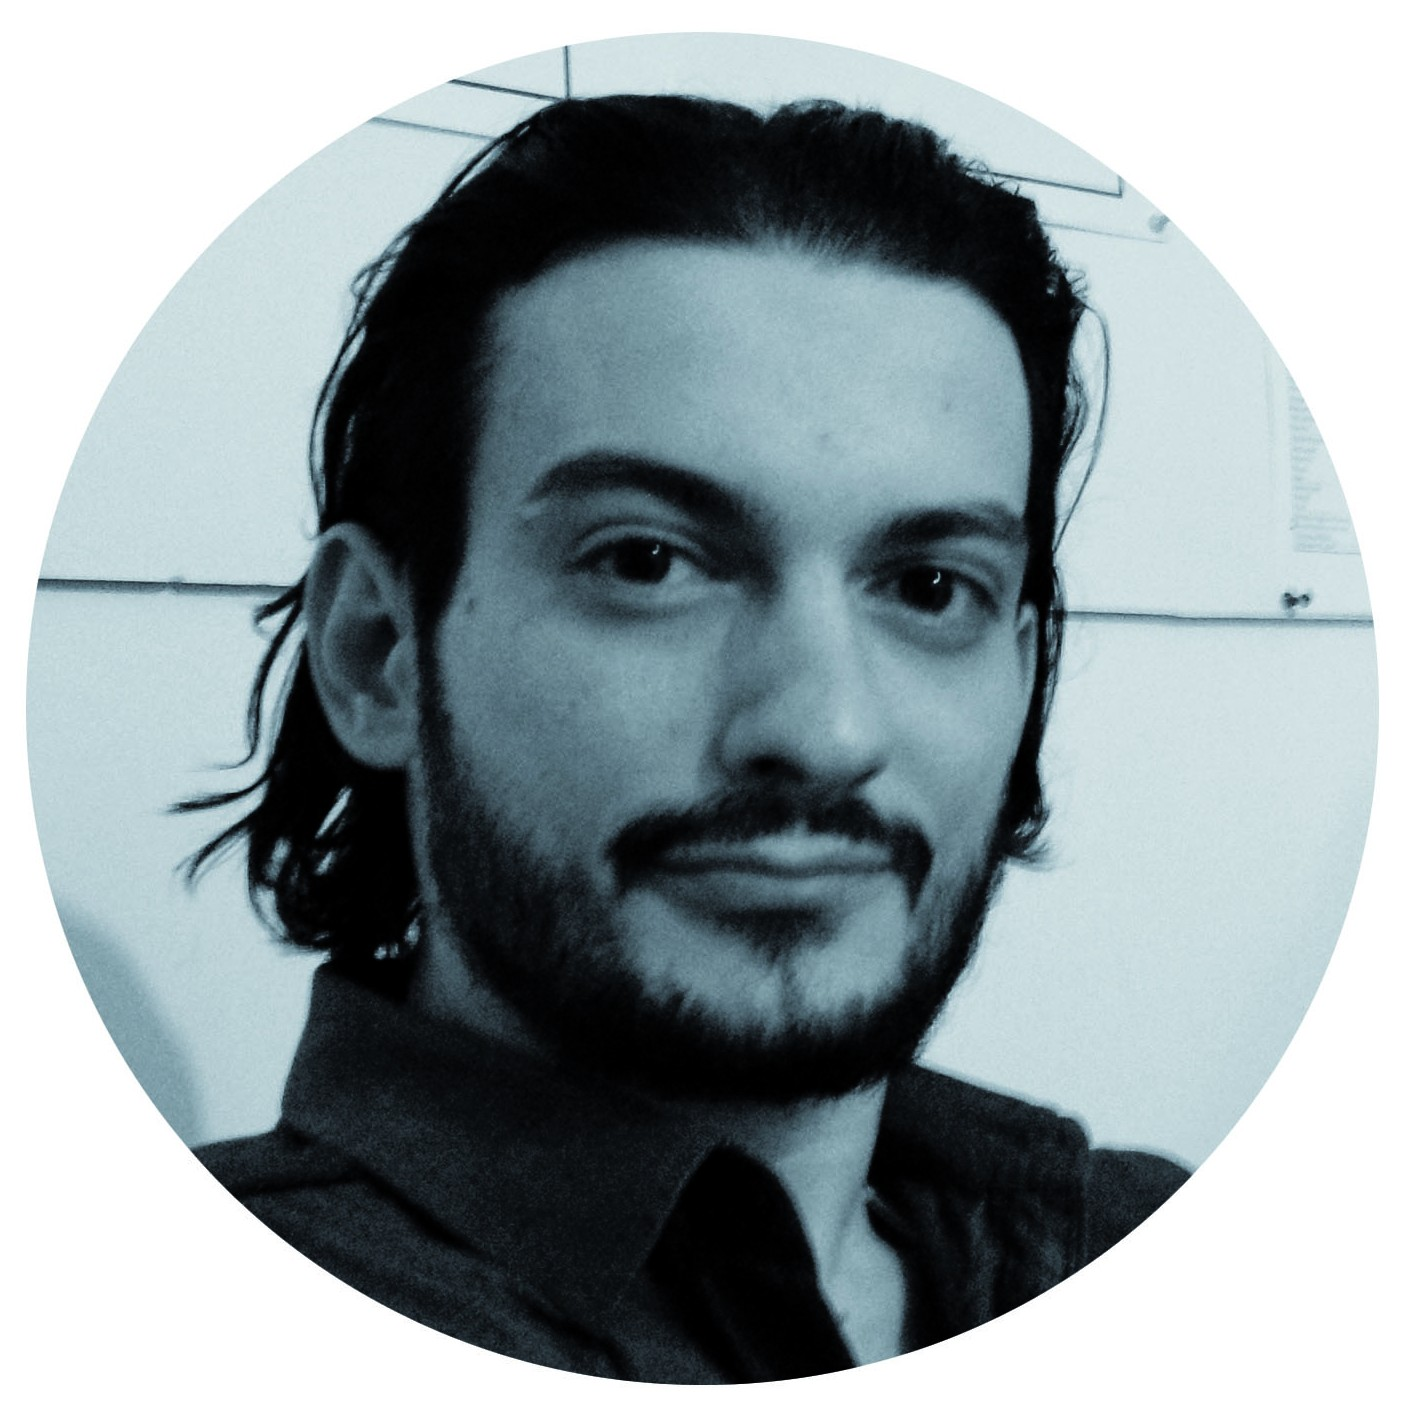 Ali Makhzoumi